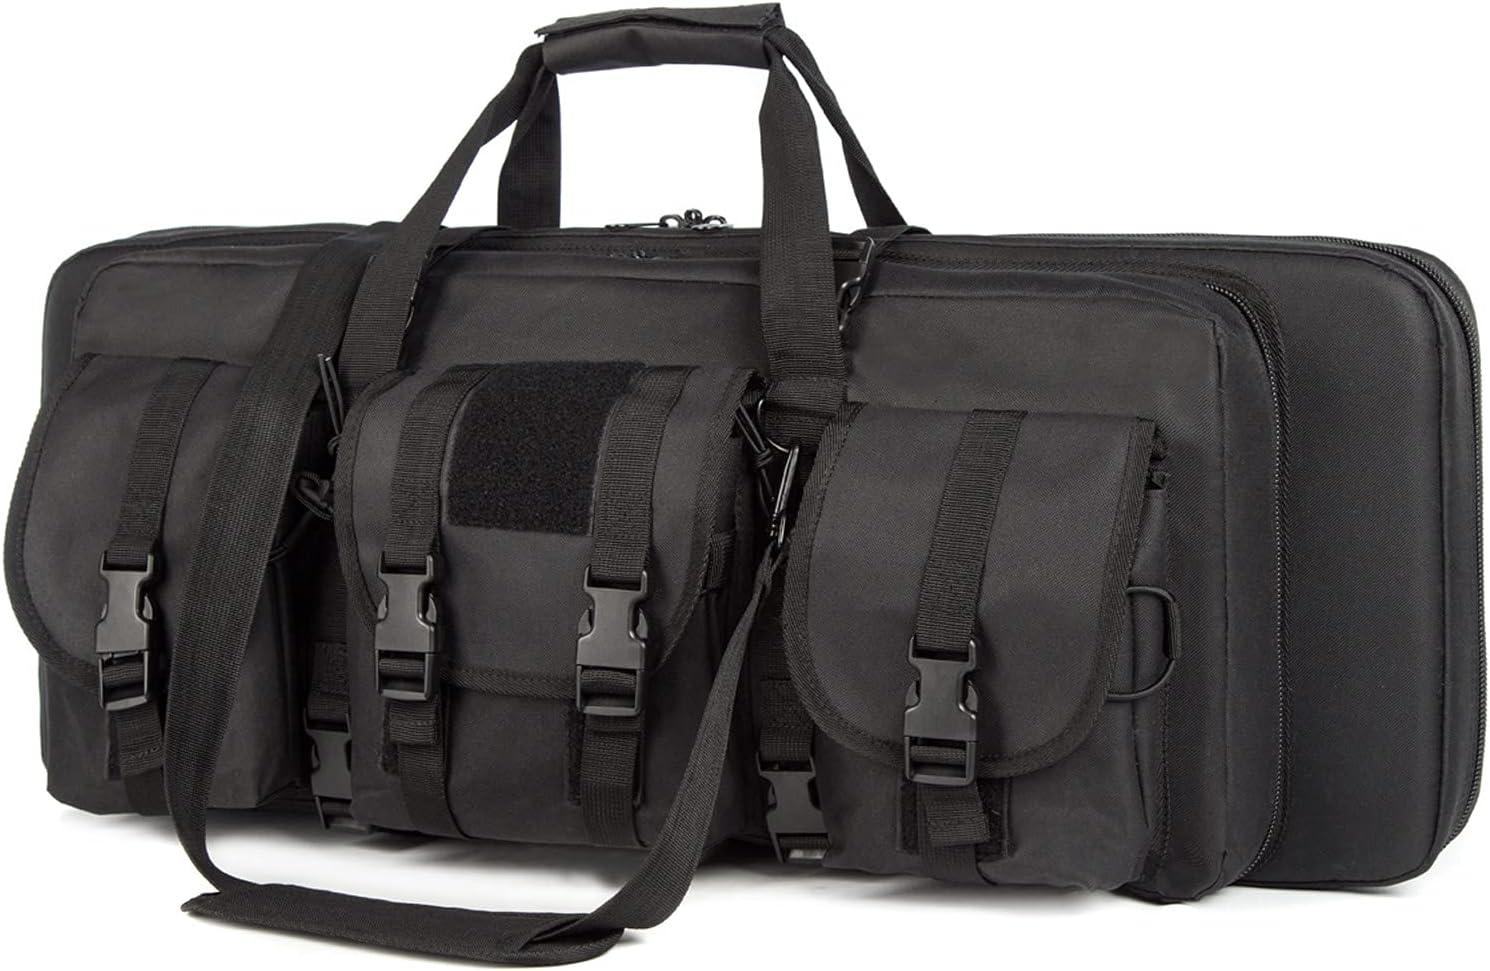 Houston Mall AIRTTUZ Double Rifle Case Tactical Rifles for Ri Large-scale sale Bag Gun Perfect